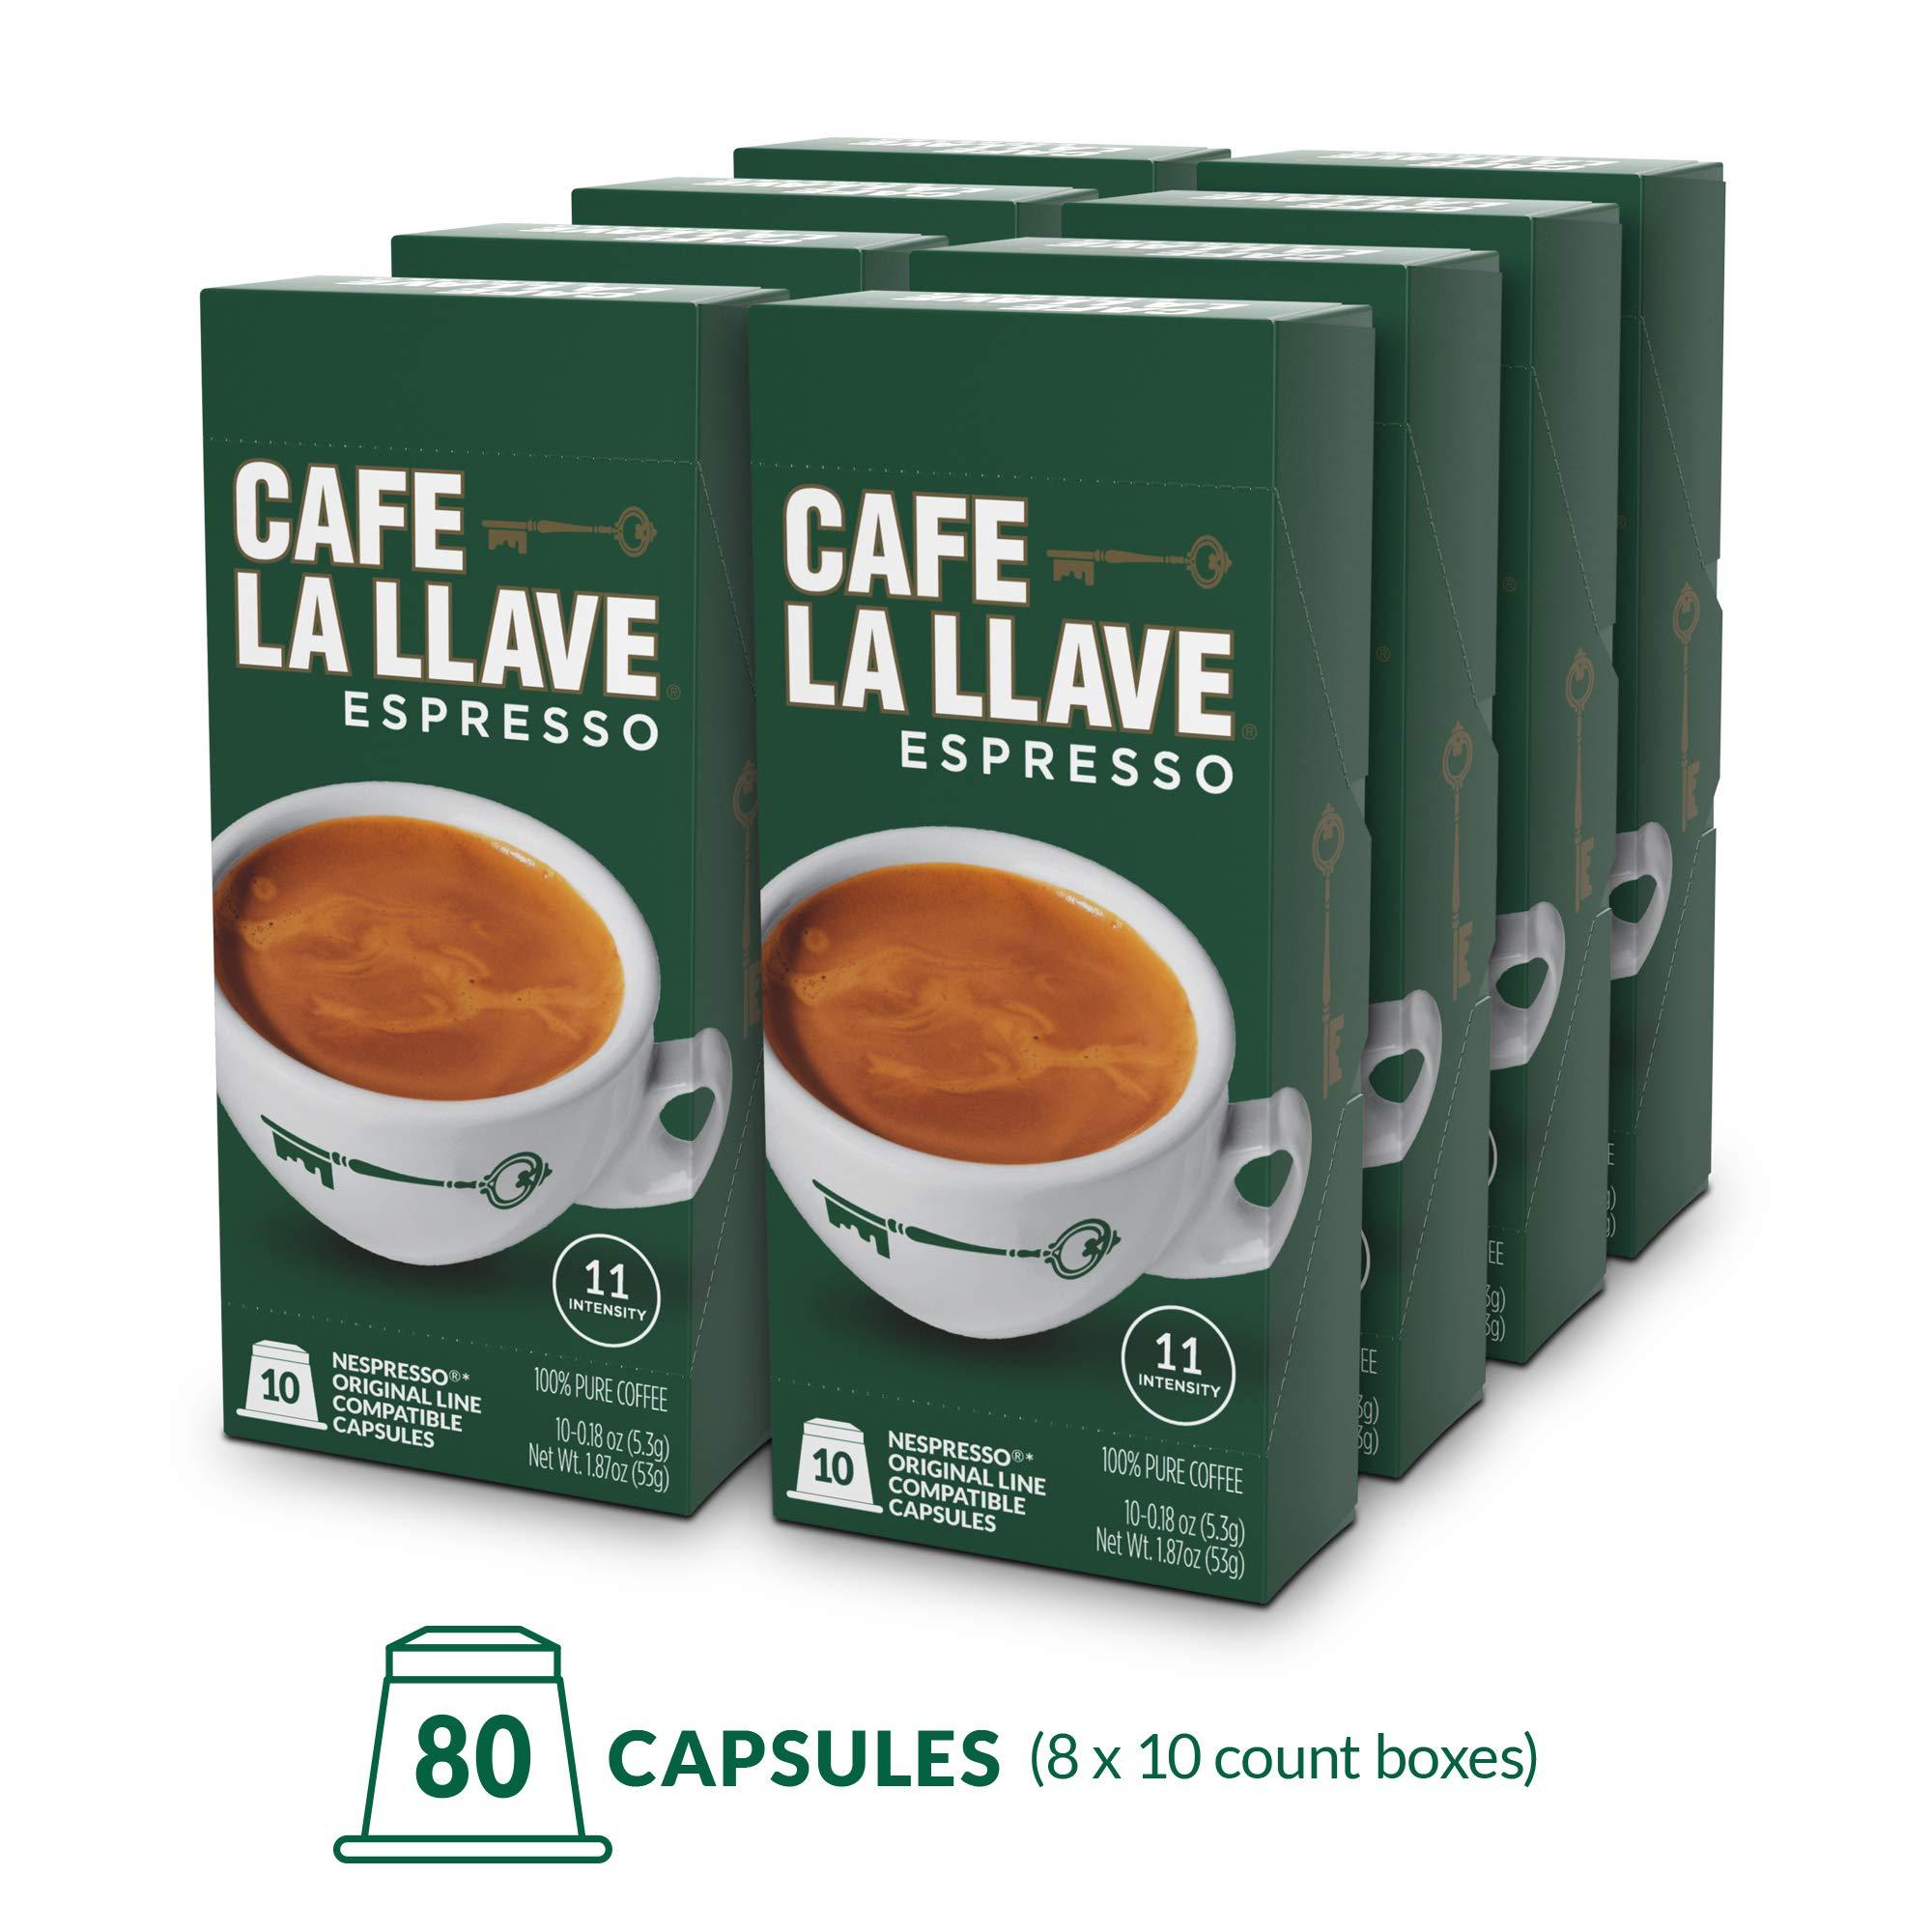 Café La Llave Espresso Capsules, Intensity 11 (80 Pods) Compatible with Nespresso OriginalLine Machines, Single Cup Coffee